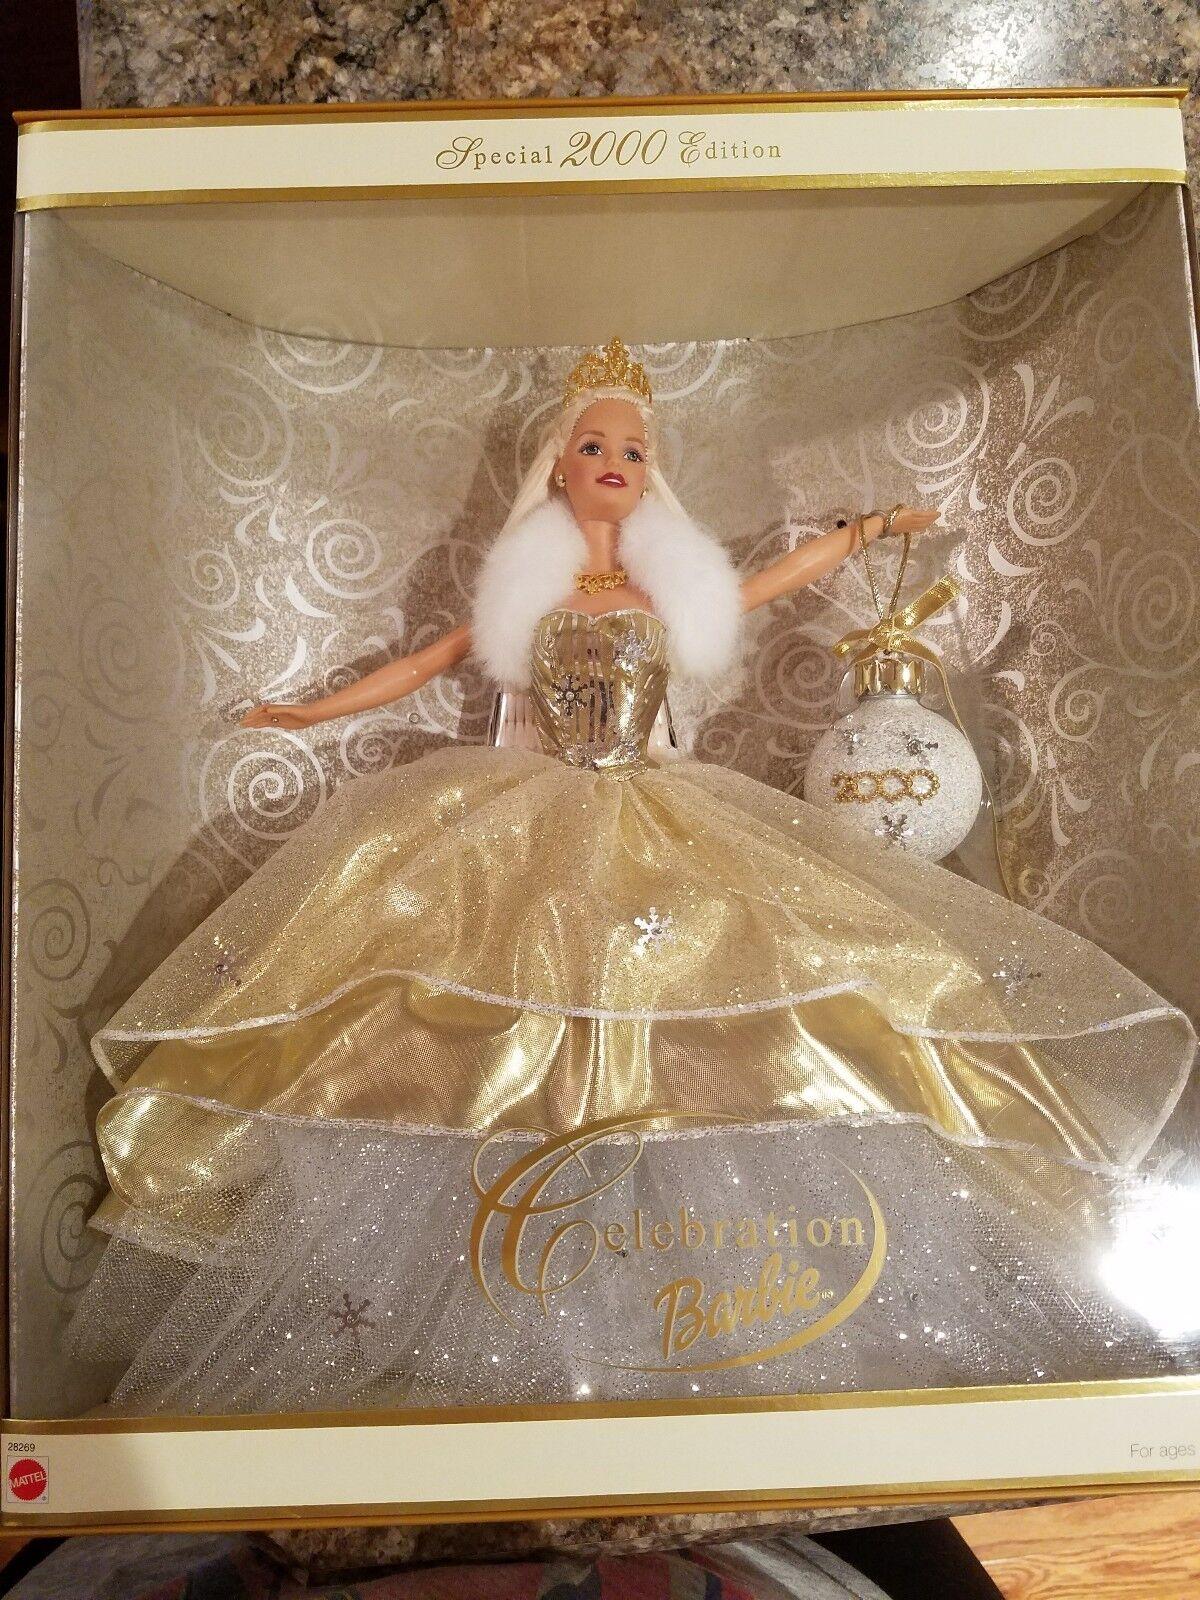 New In Box Barbie Holiday Xmas Celebration Special Year 2000 Ed. Y2K Doll MATEL